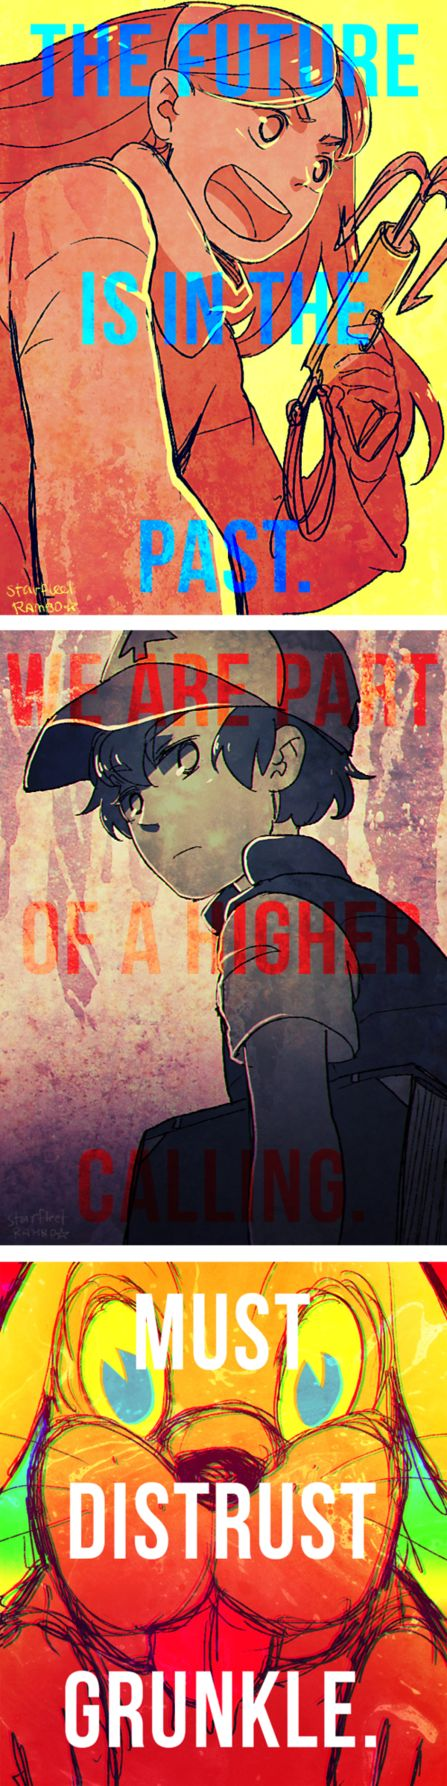 Onwards, Aoshima! by demitasse-lover on DeviantArt